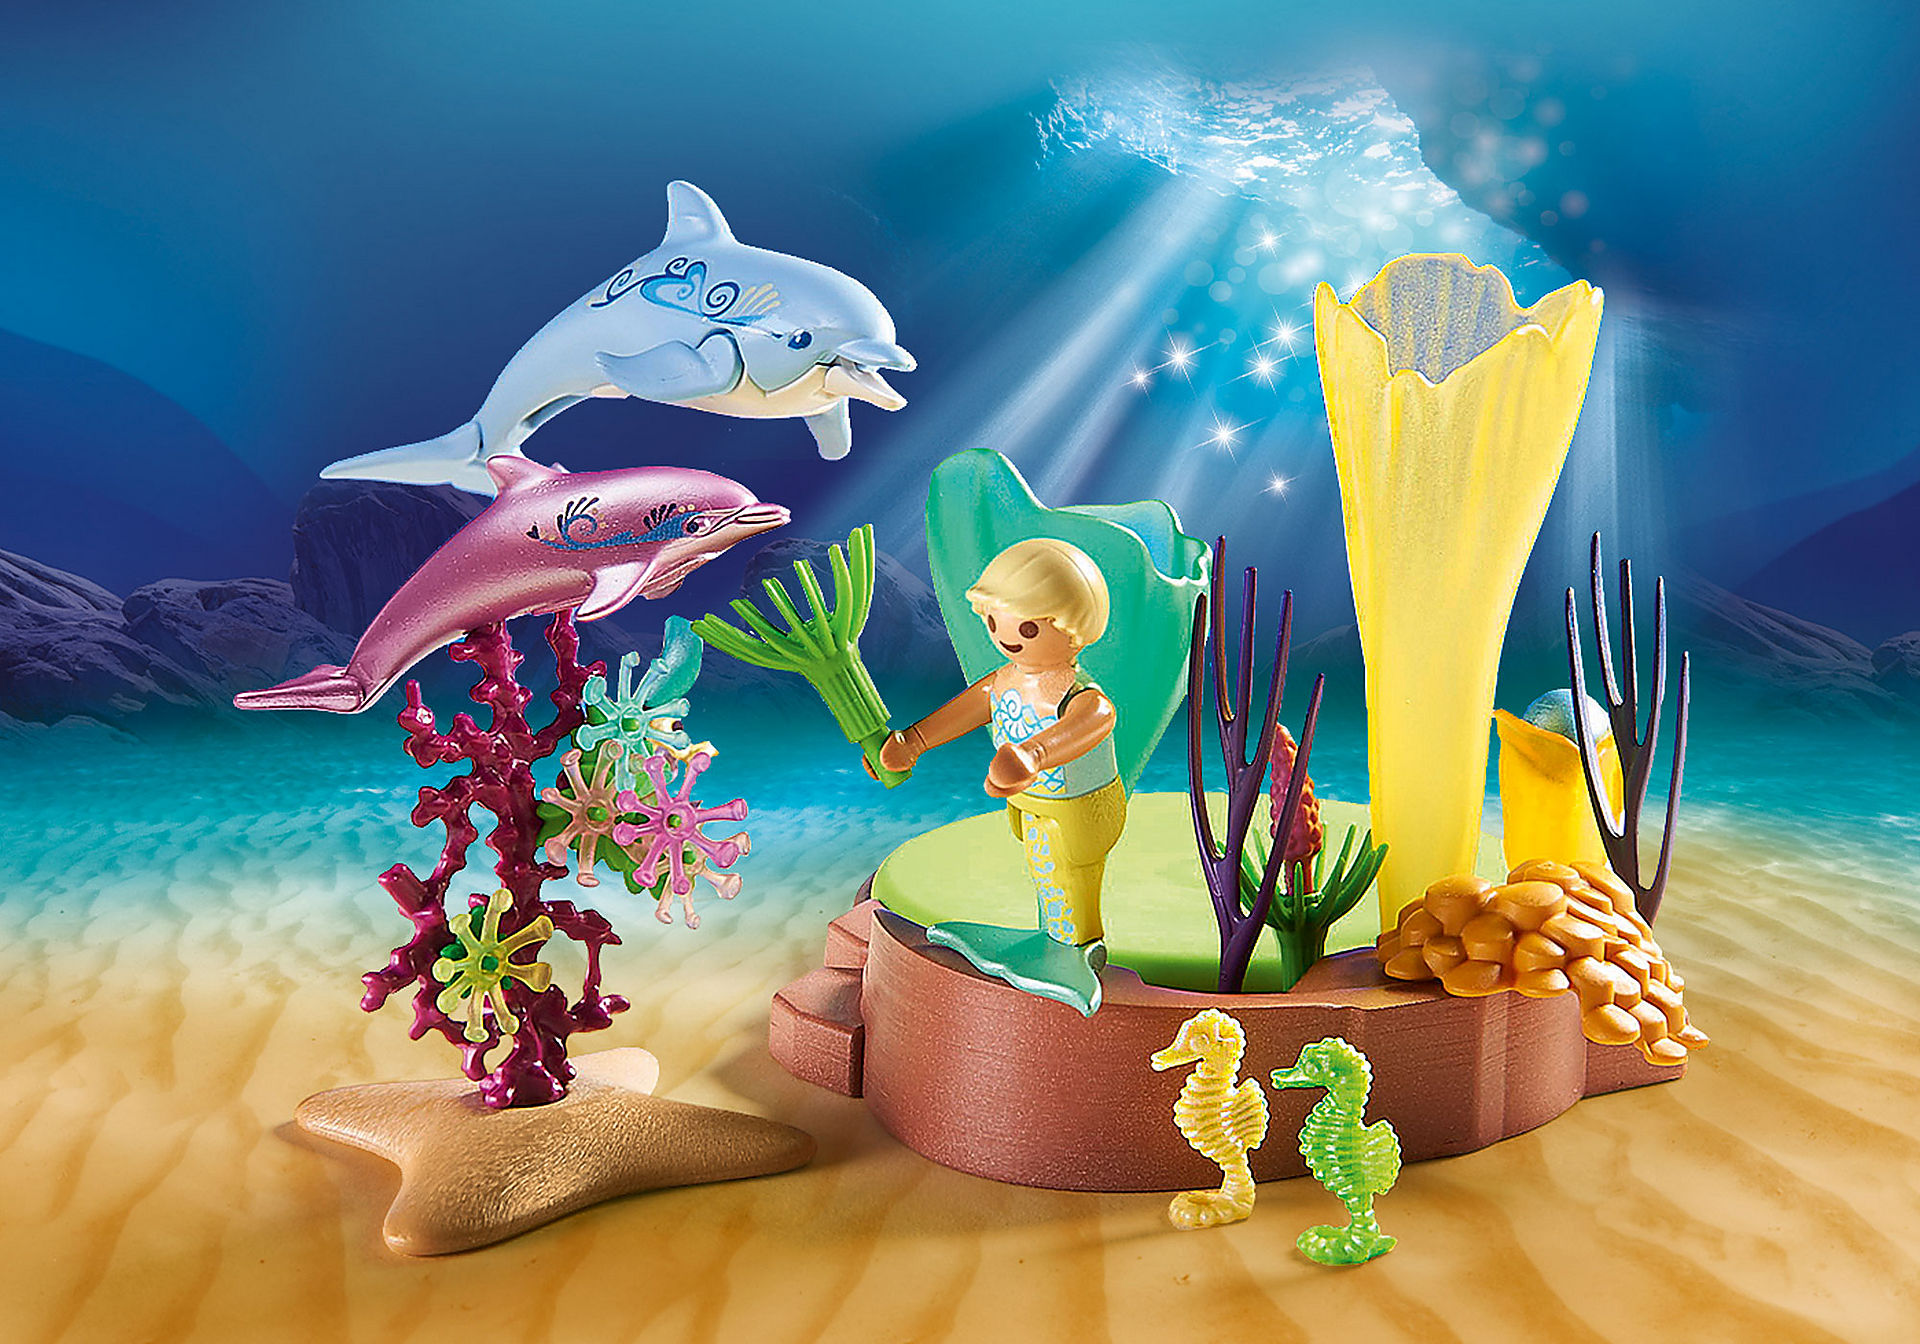 70094 Cala de Sirenas con Cúpula Iluminada zoom image5